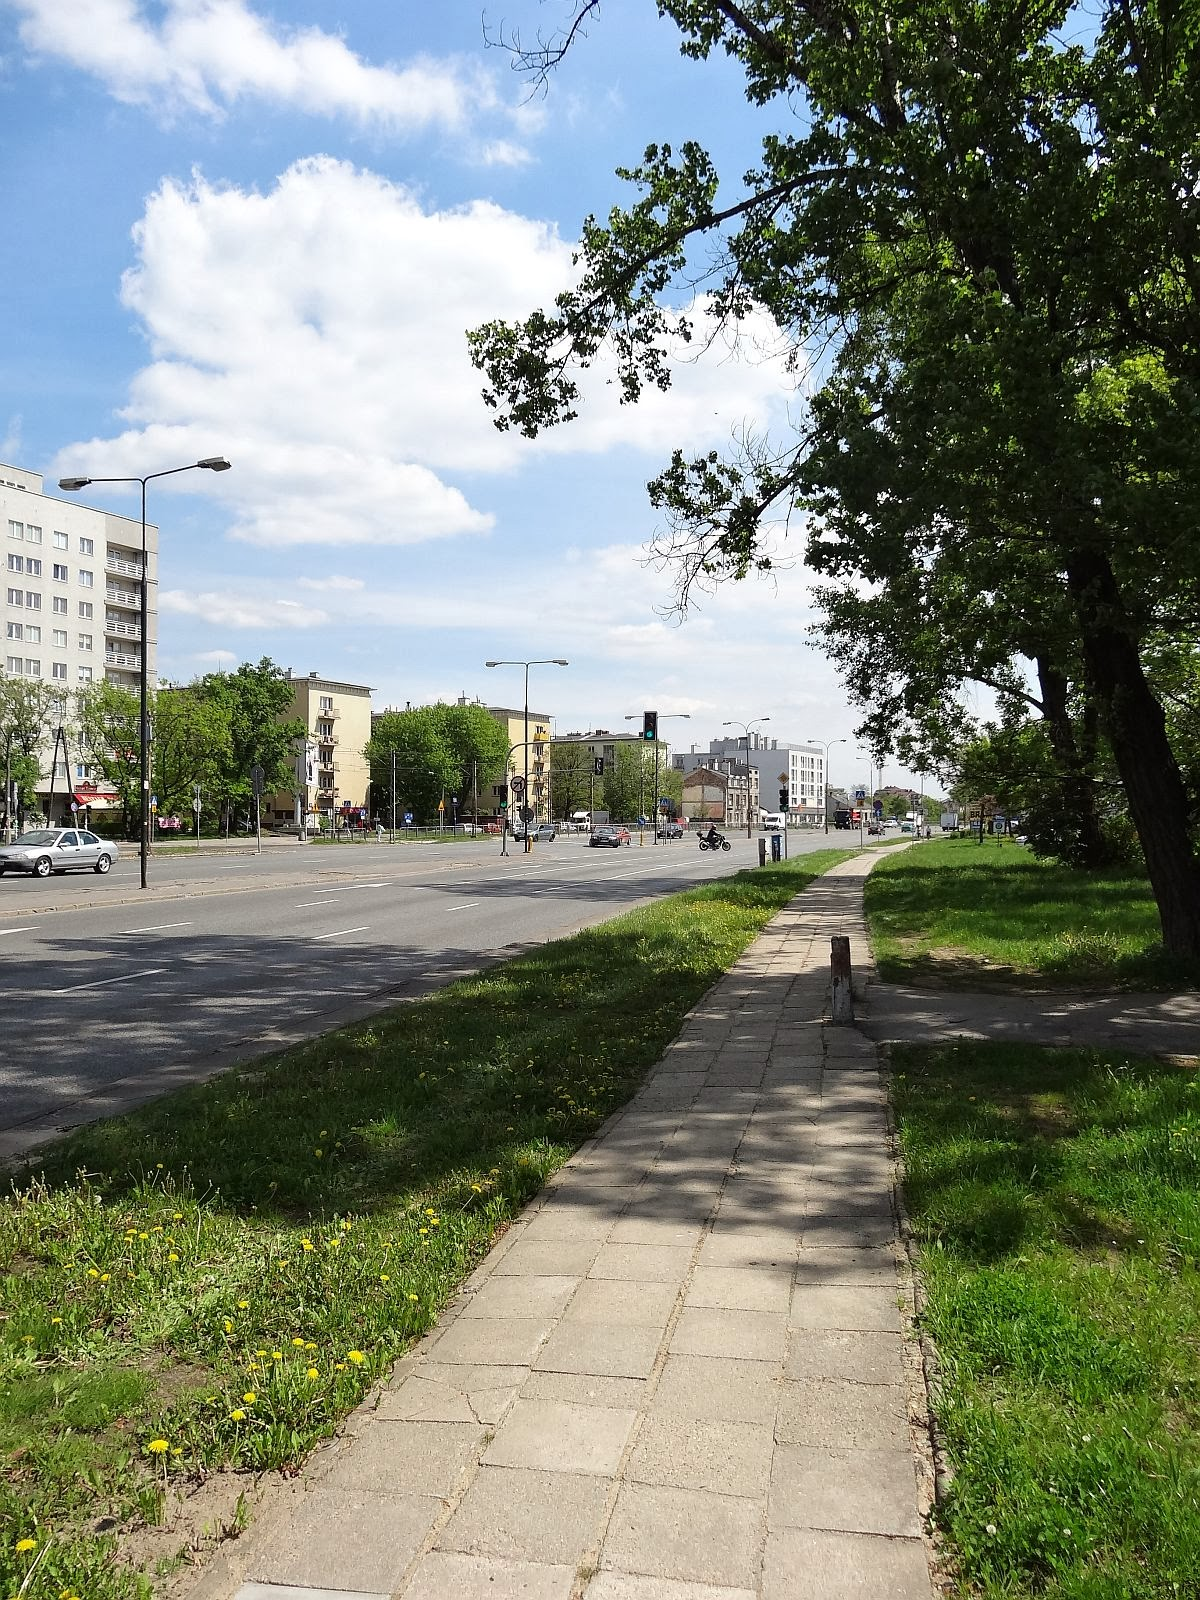 Północna granica Witolina. Ulica Grochowska